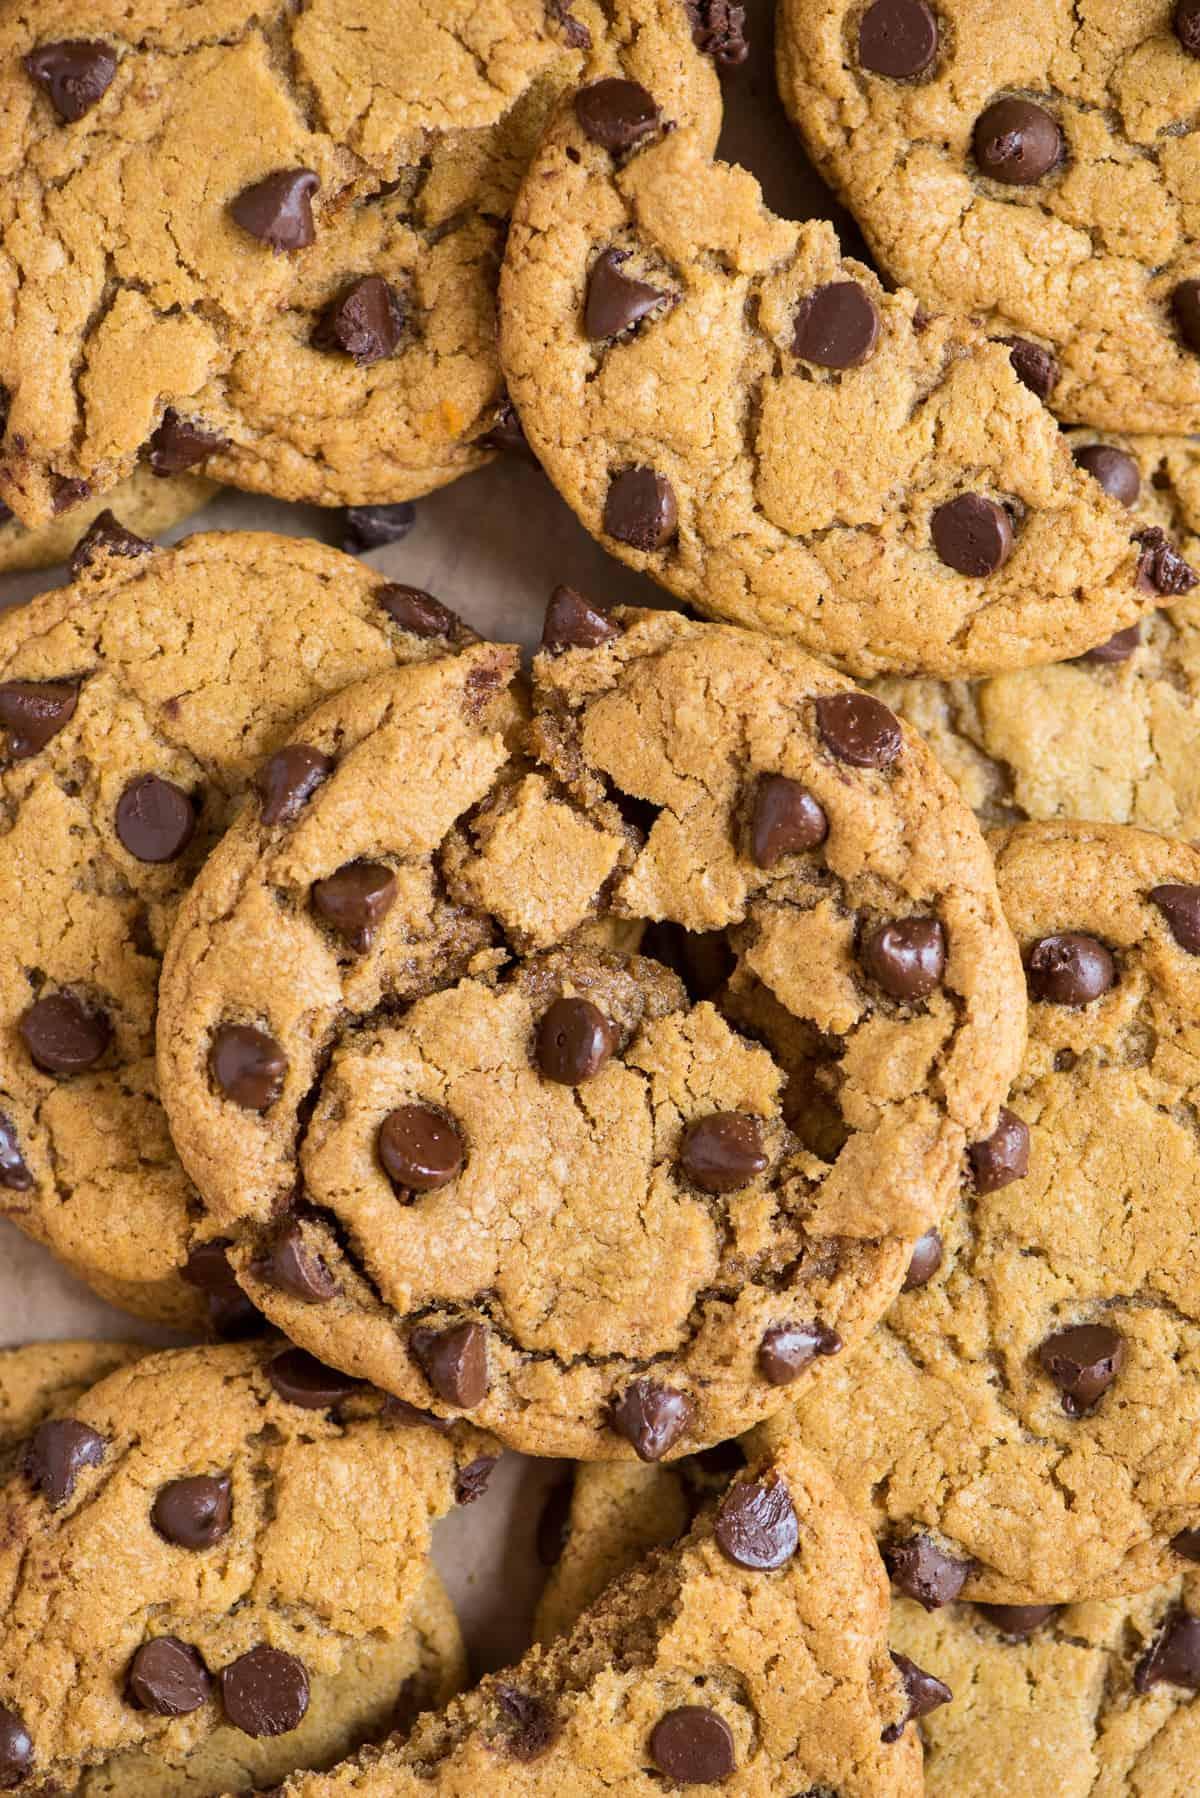 pumpkin chocolate chip cookie arranged on top of more cookies